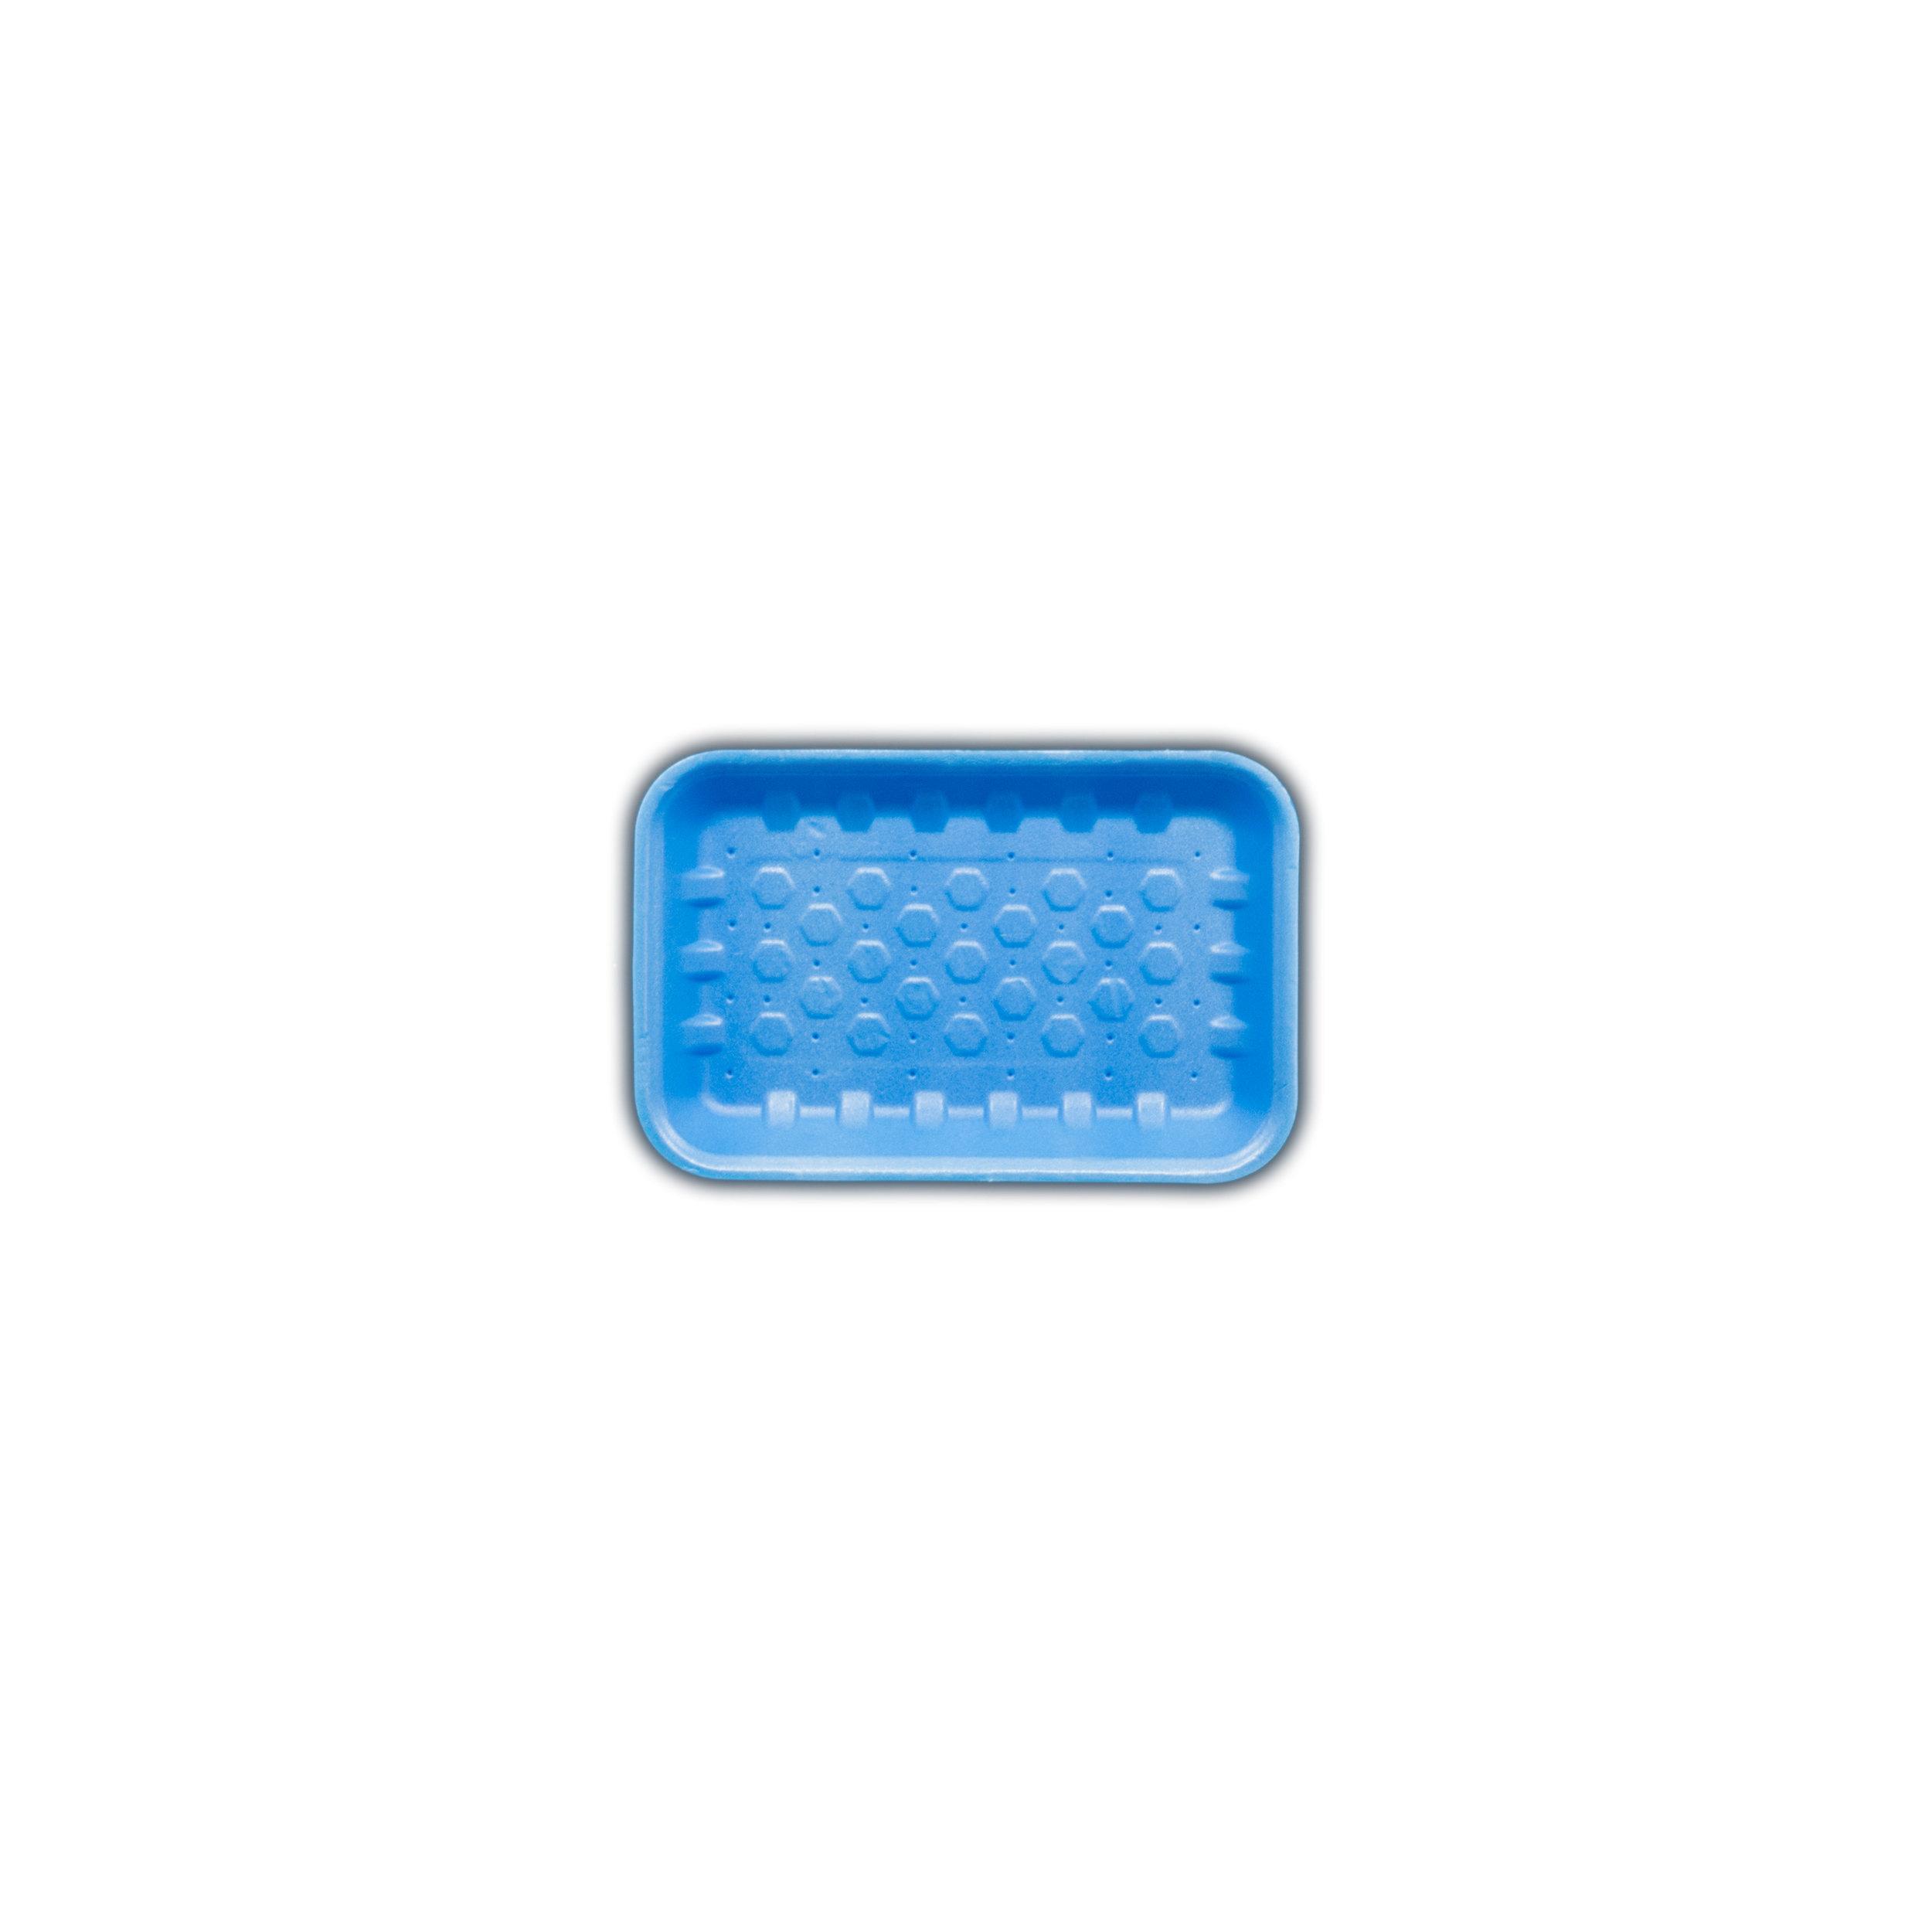 iK-0632      OPEN CELL 25mm blue 8x5    90 per sleeve 360 per carton